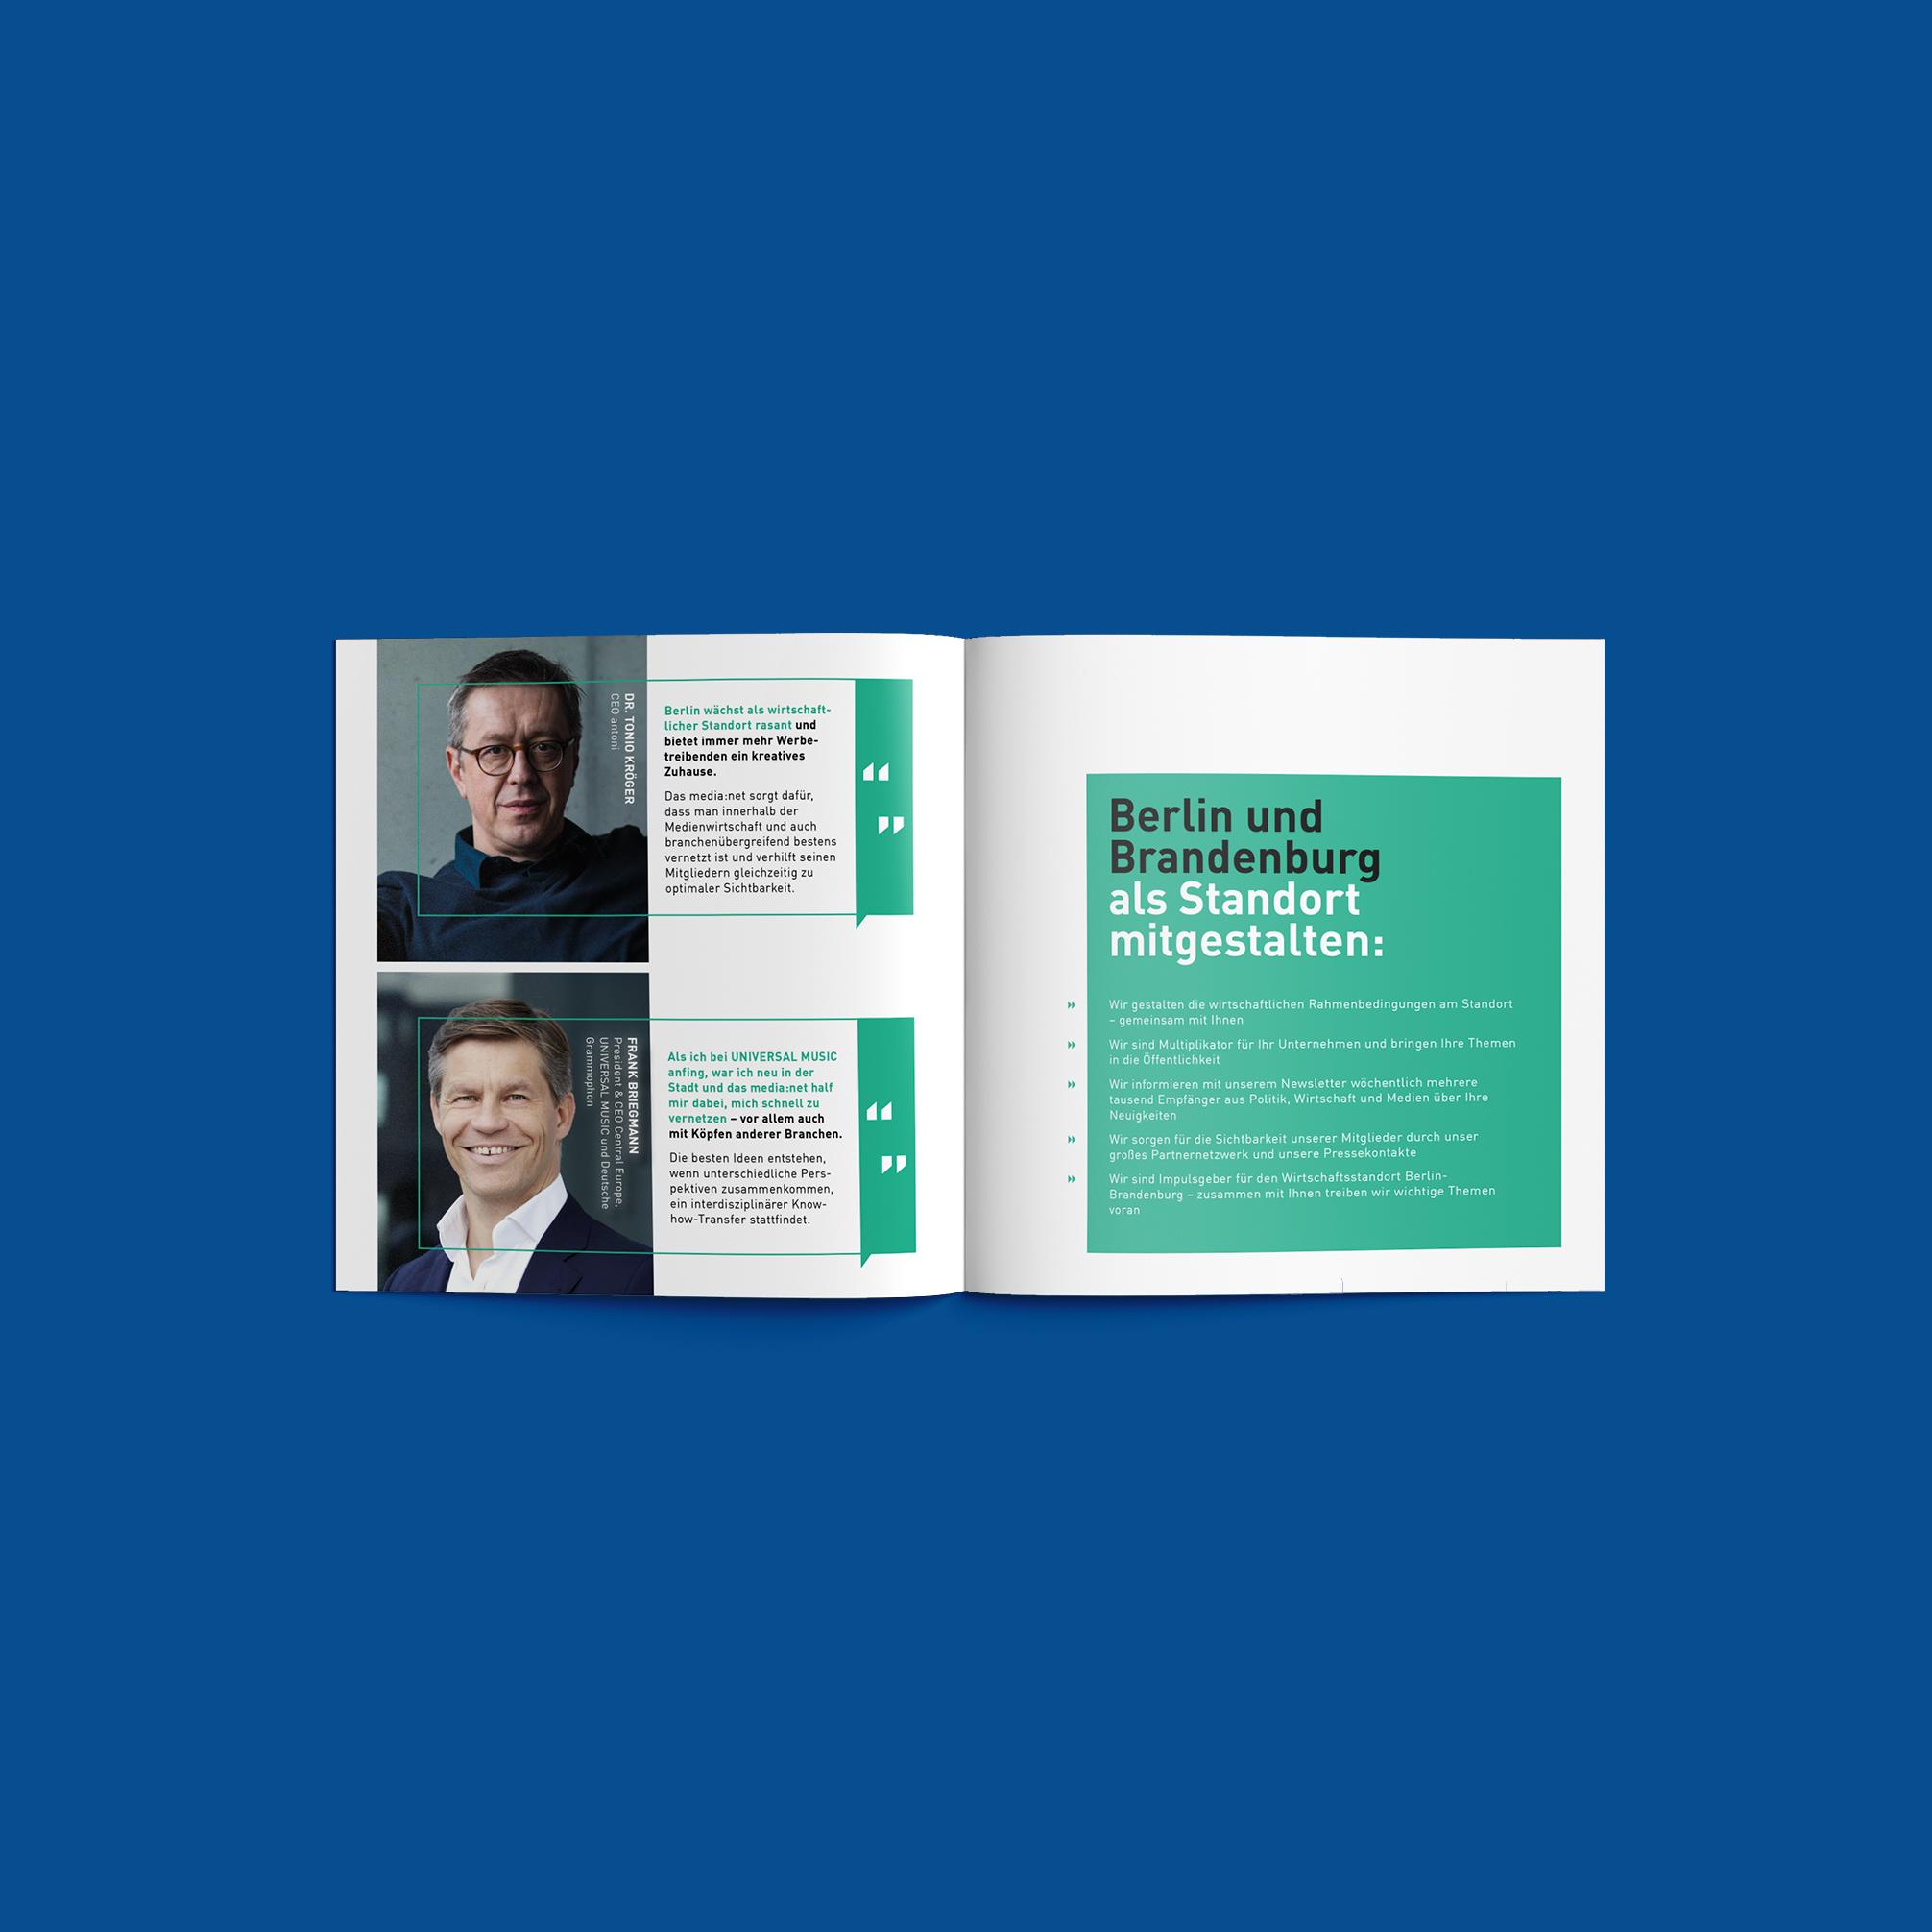 Media net berlinbrandenburg Image Booklet   Redesign Corporate Identity - Berlin